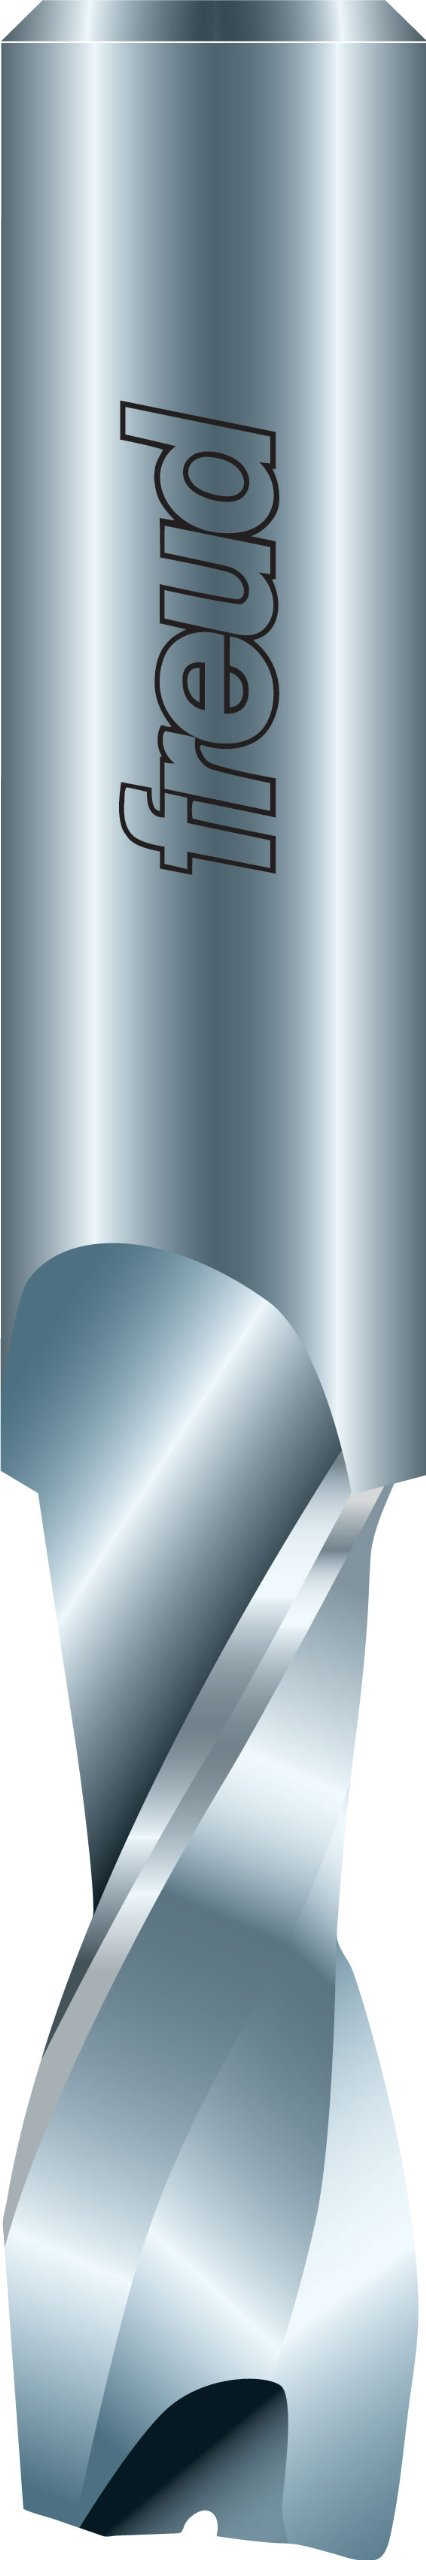 Freud 75-306 3/8-Inch Up Spiral Router Bit (1/2-Inch Shank)